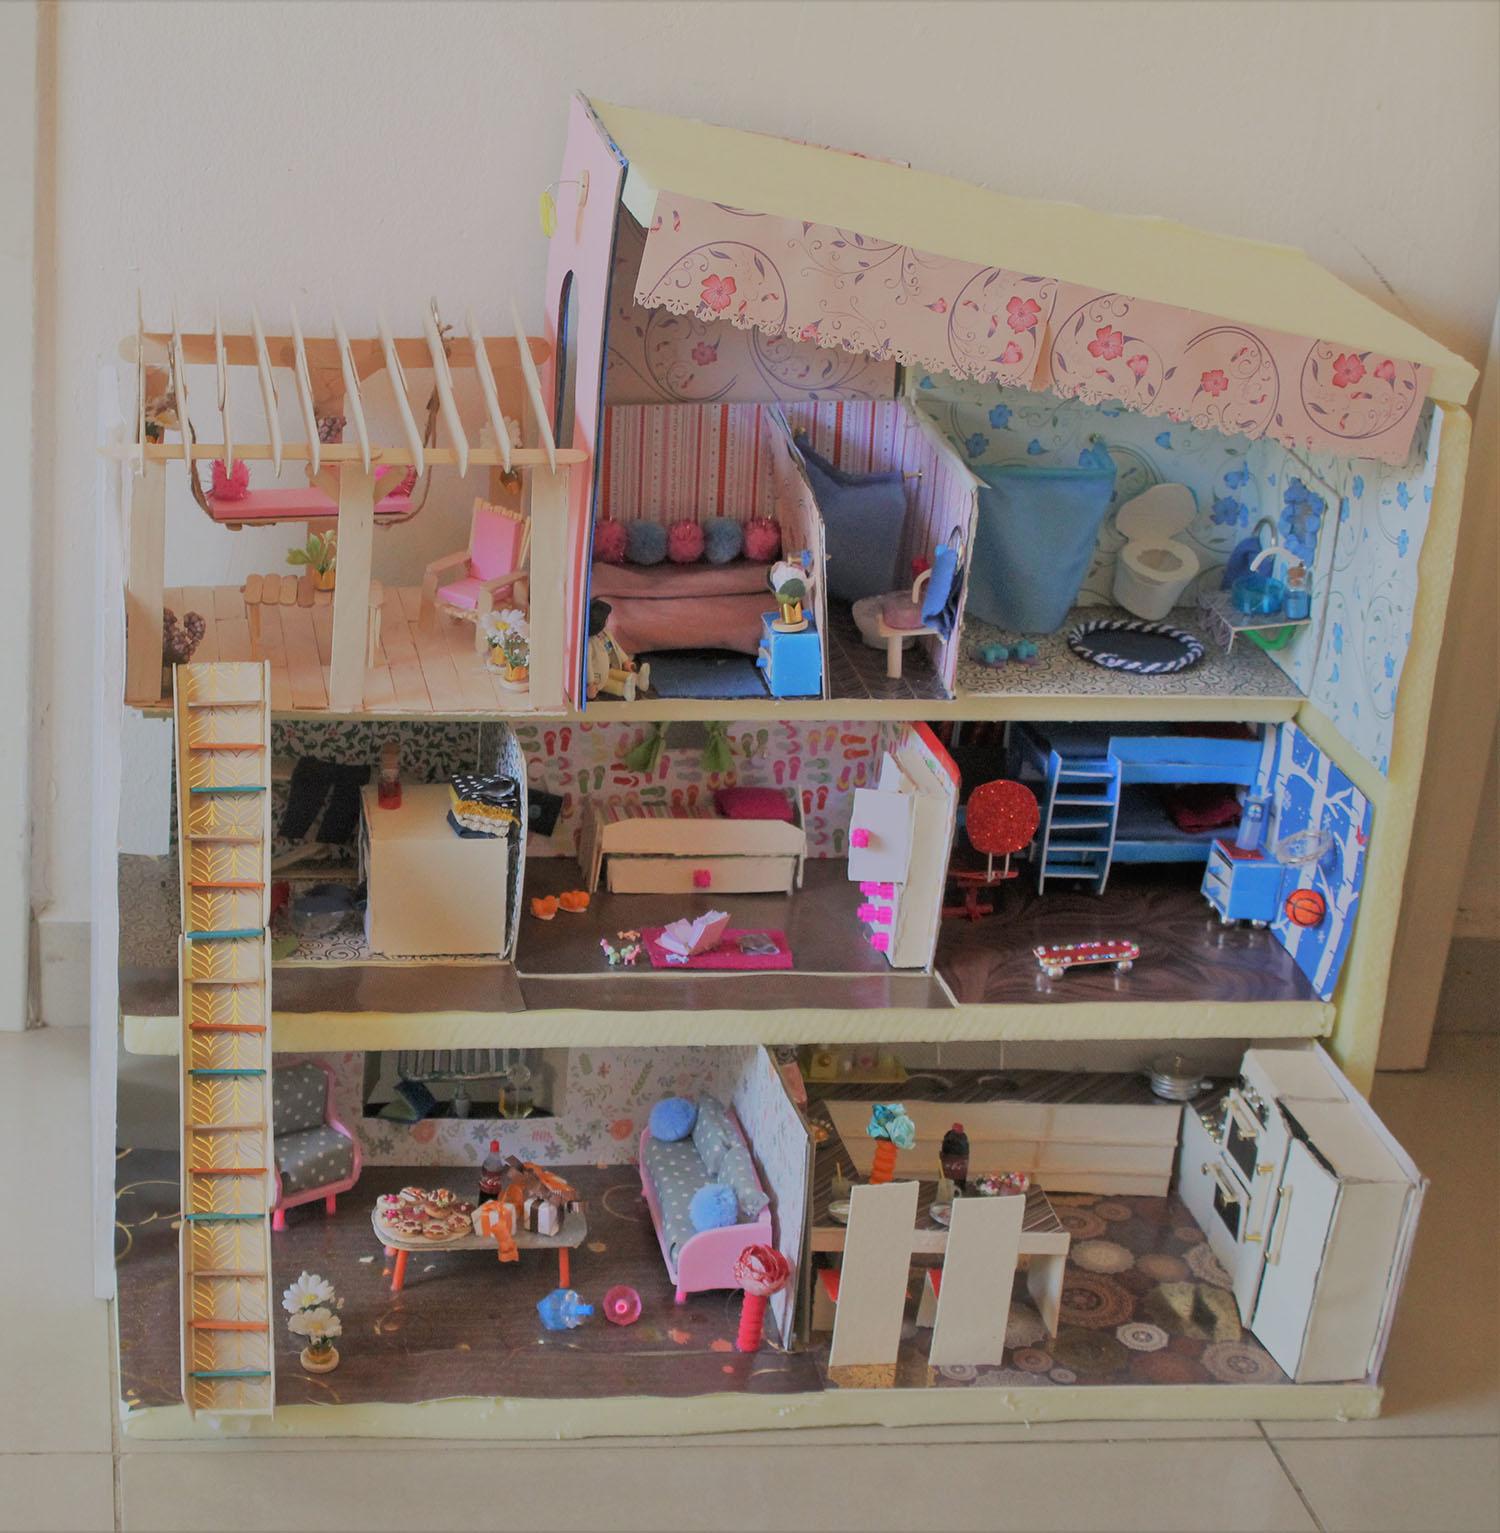 IMG 5969 - מיניאטורות: סיימנו את הבית